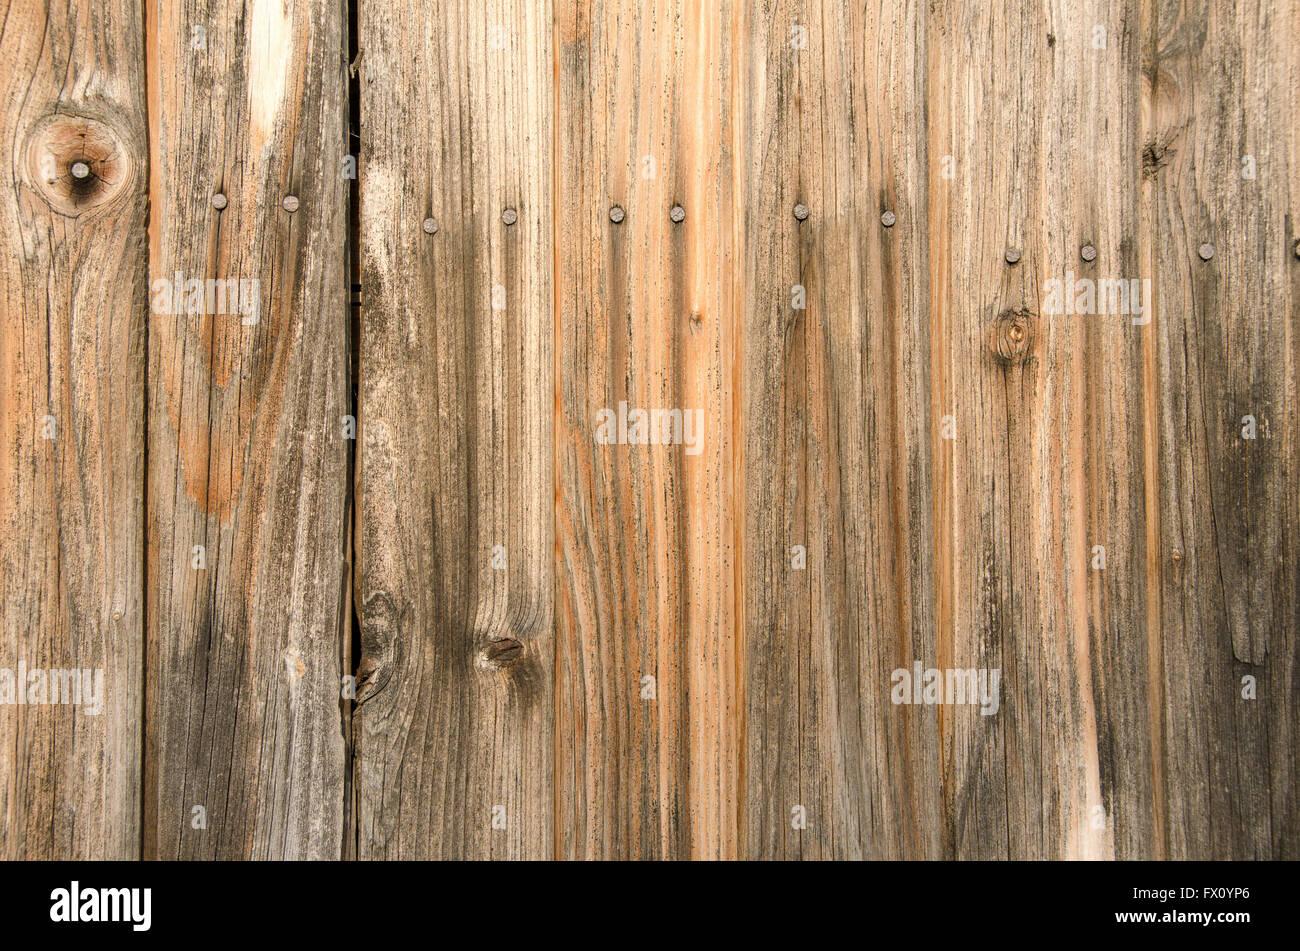 vertikale alte holzbohlen mit nägel hintergrund stockfoto, bild